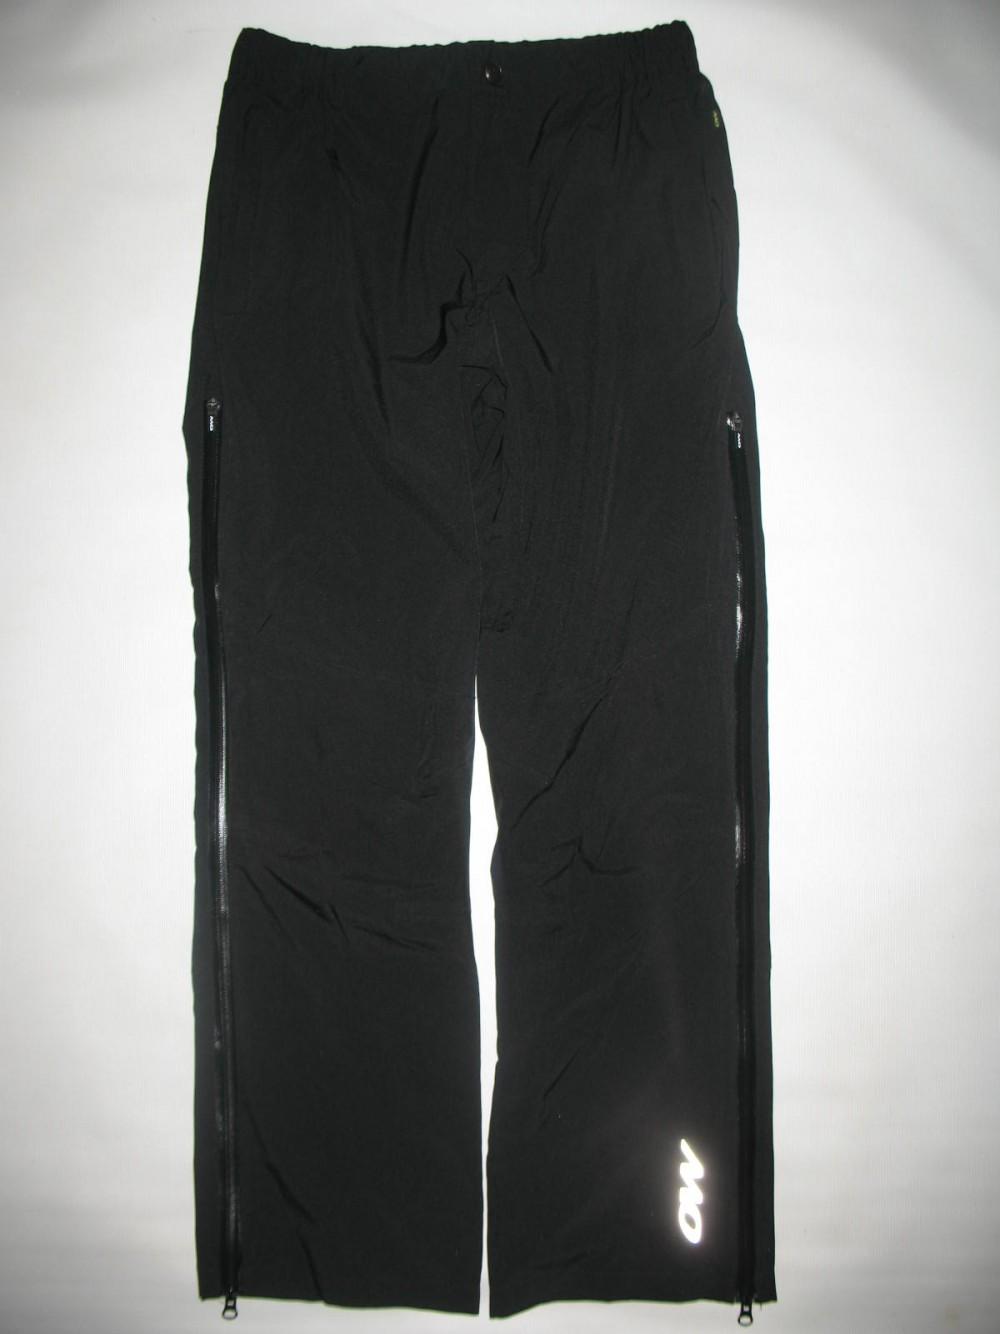 Штаны OW(ONE WAY) trekking pants (размер M) - 1